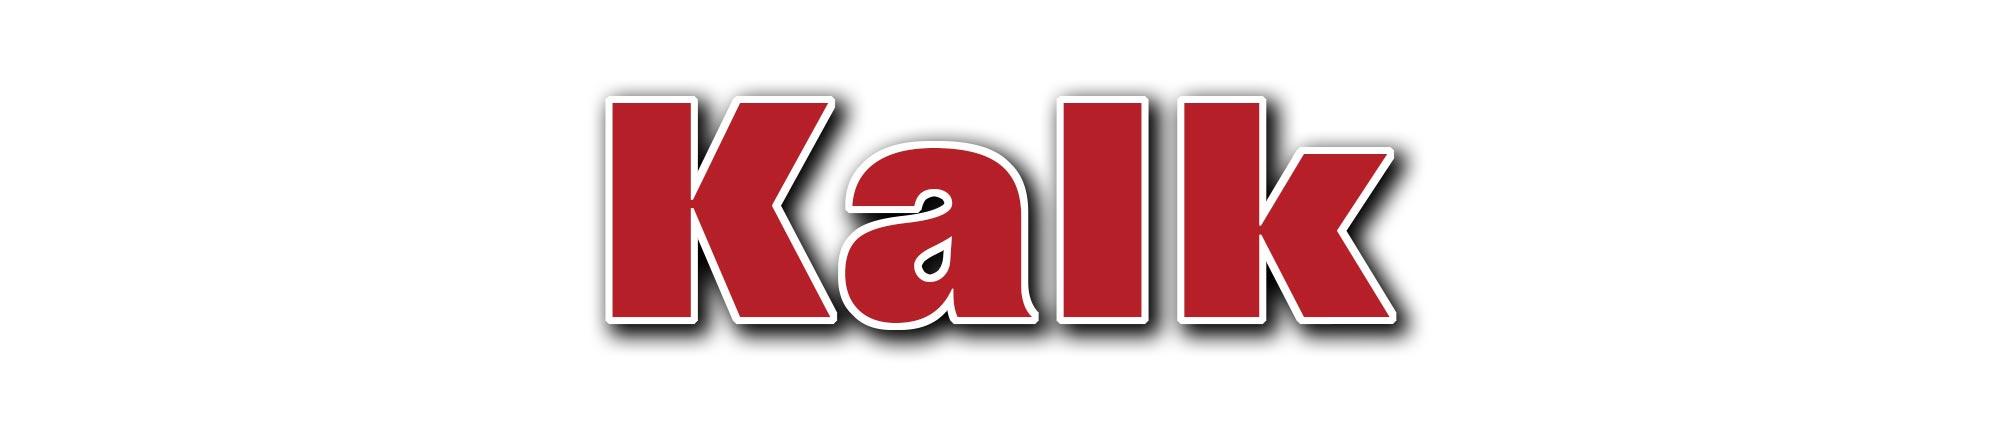 Bezirksvertretung-Kalk